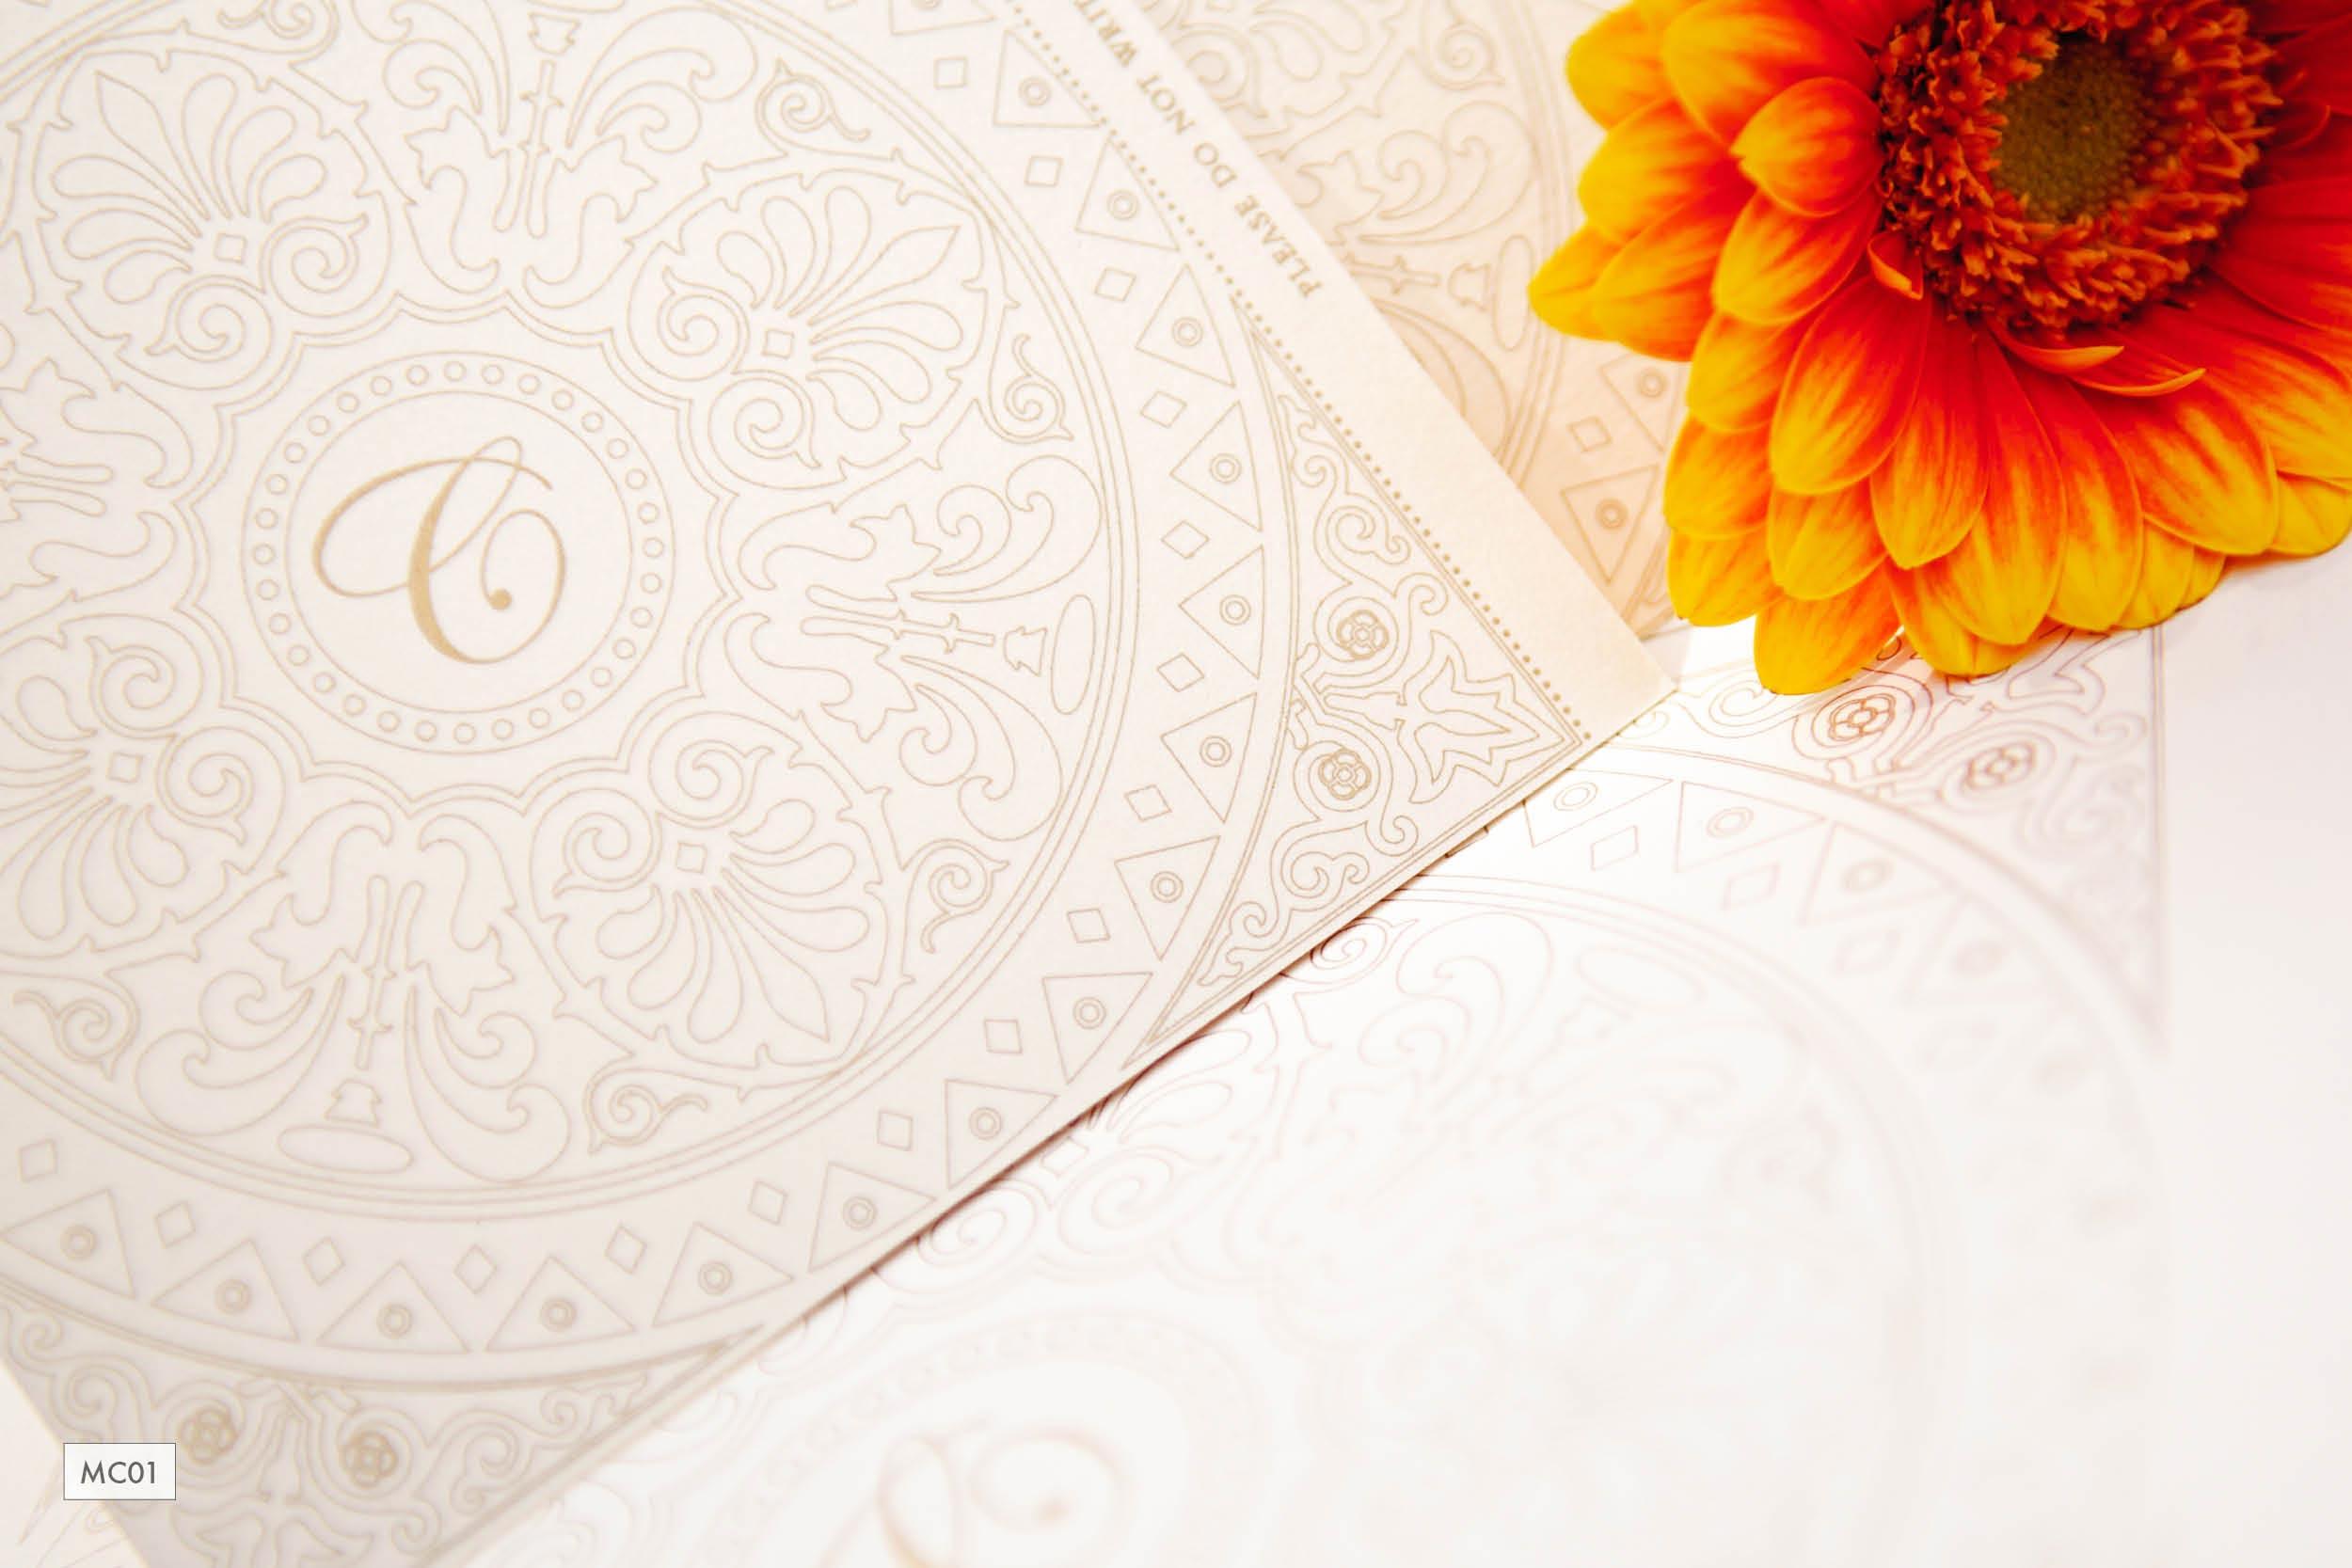 Monogram-cream-and-gold-wedding-wish-tag_ananyacards.com.jpg